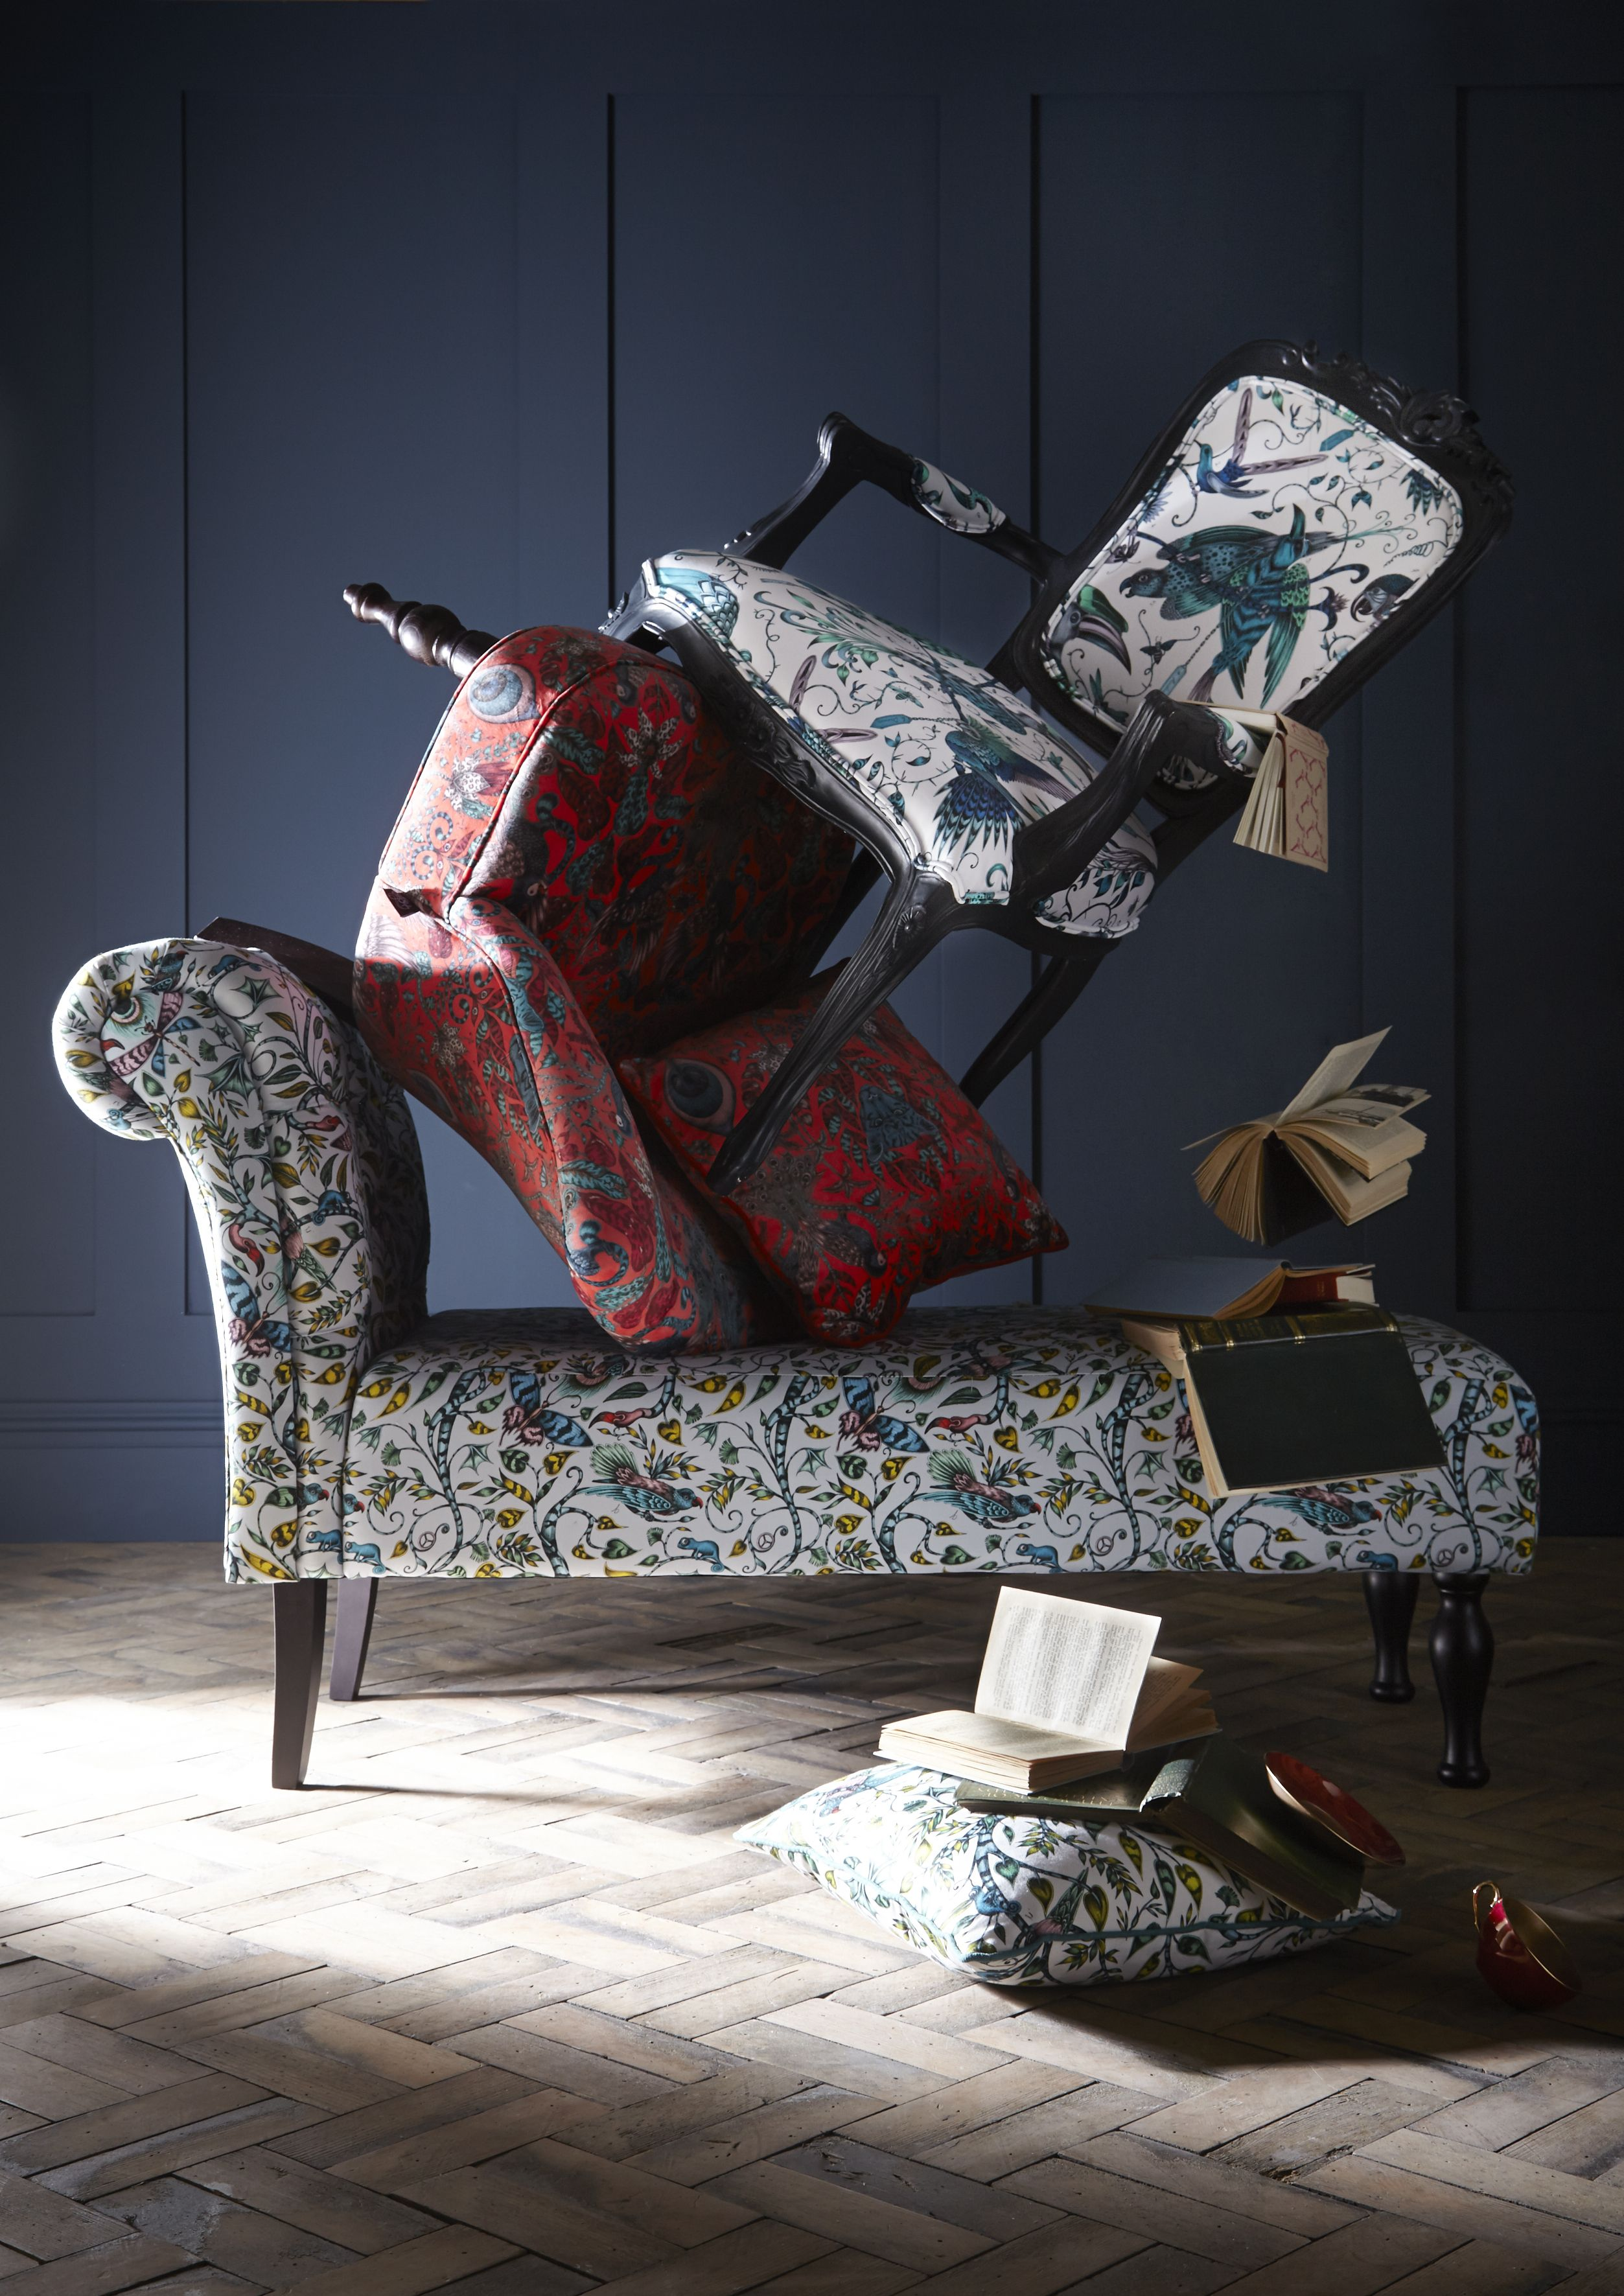 Emma J Shipley X Clarke U0026 Clarke Furniture Following On From The Success Of  Emma J Shipleyu0027s U0027Animaliau0027 Collection Of Furnishing Fabrics And  Wallpapers,we ...